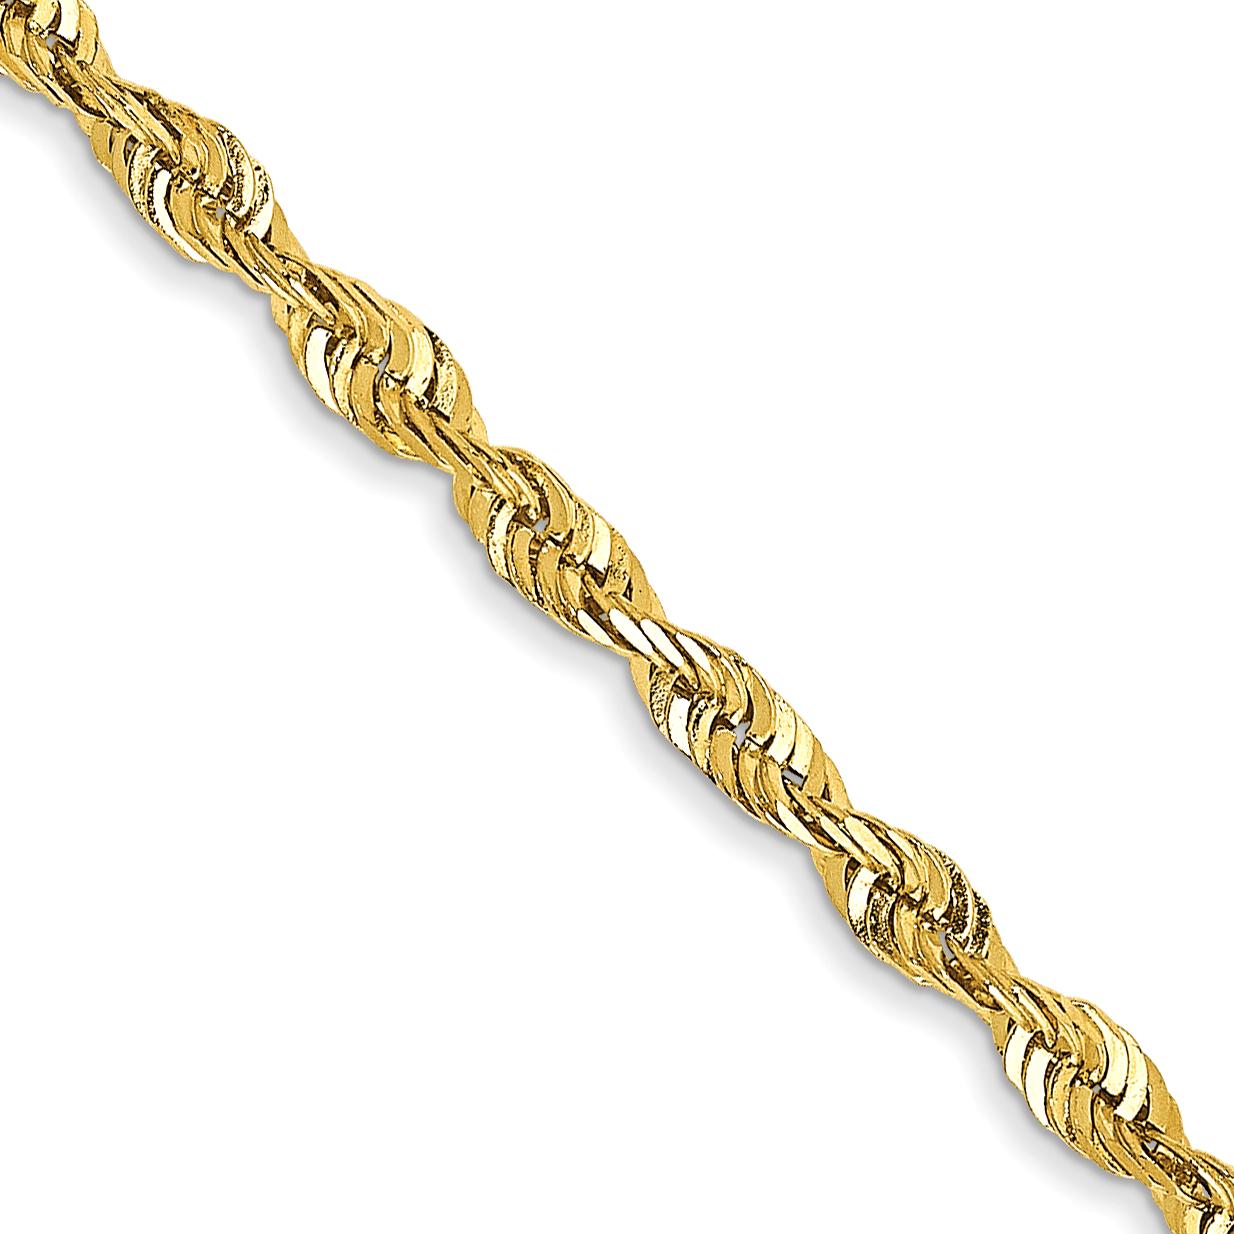 10k 16 Inch 2.25mm Diamond-cut Extra-Lite Rope Chain